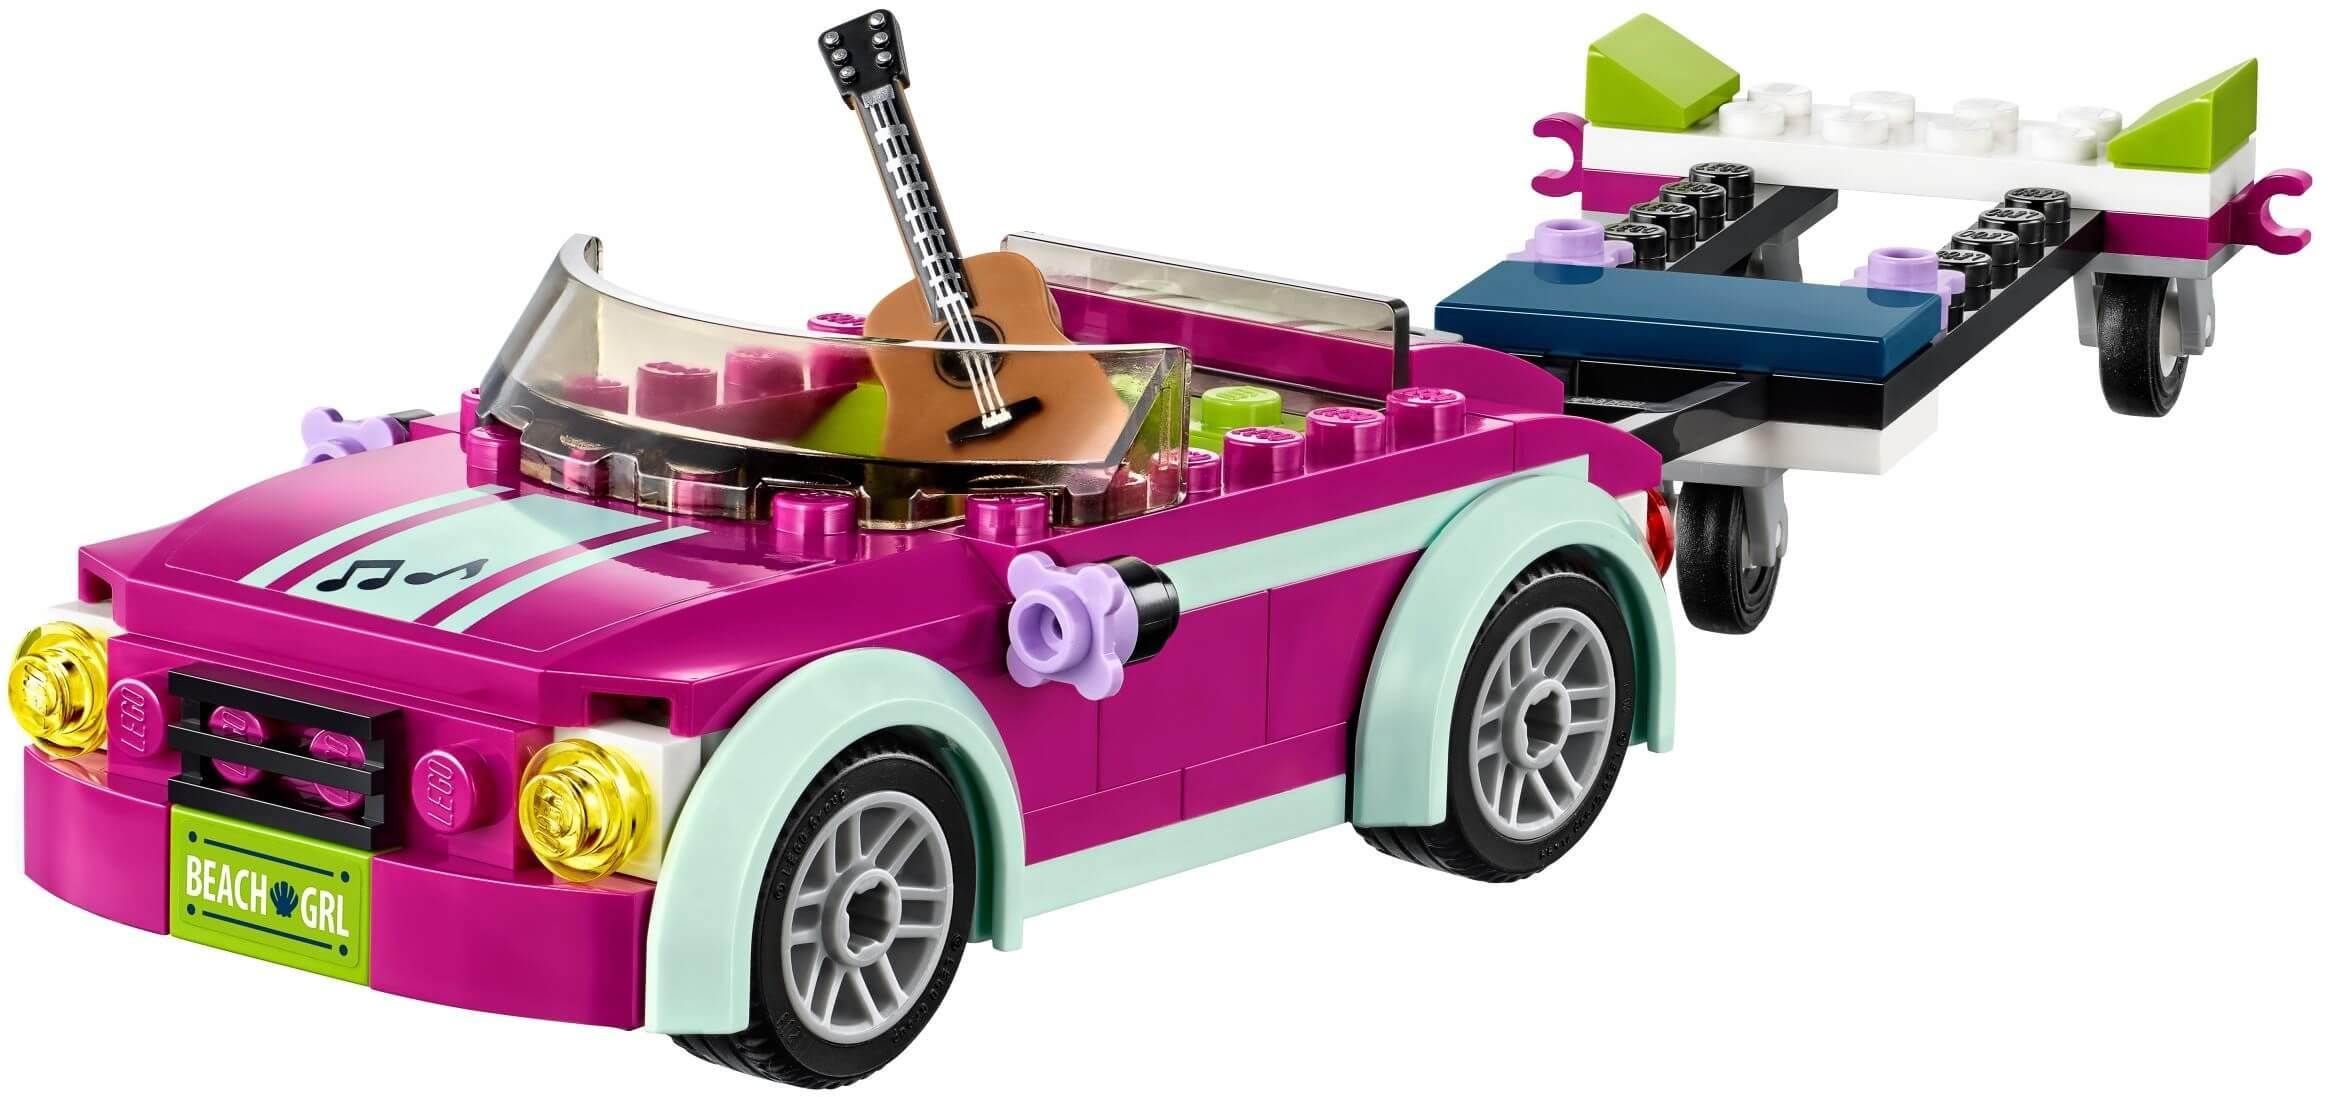 Mua đồ chơi LEGO 41316 - LEGO Friends 41316 - Xe chở Du Thuyền của Andrea (LEGO Friends Andrea's Speedboat Transporter)